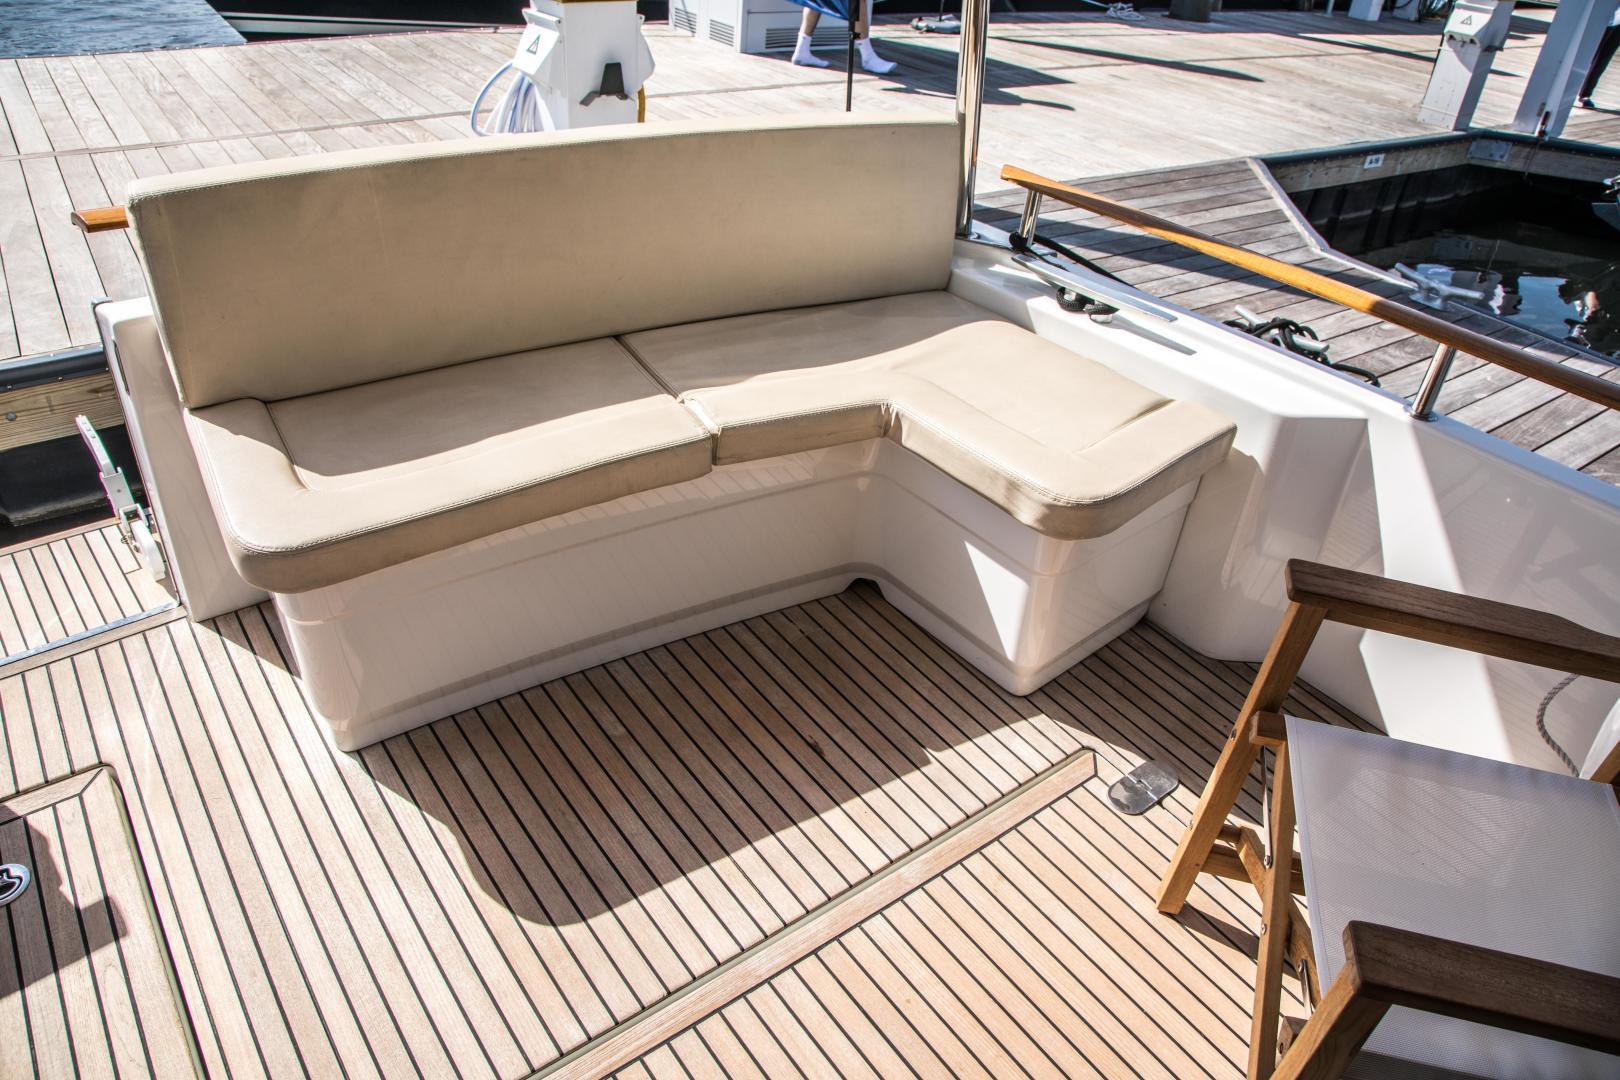 Beneteau-Swift Trawler 2012-MLC IV Baltimore-Maryland-United States-1355988 | Thumbnail